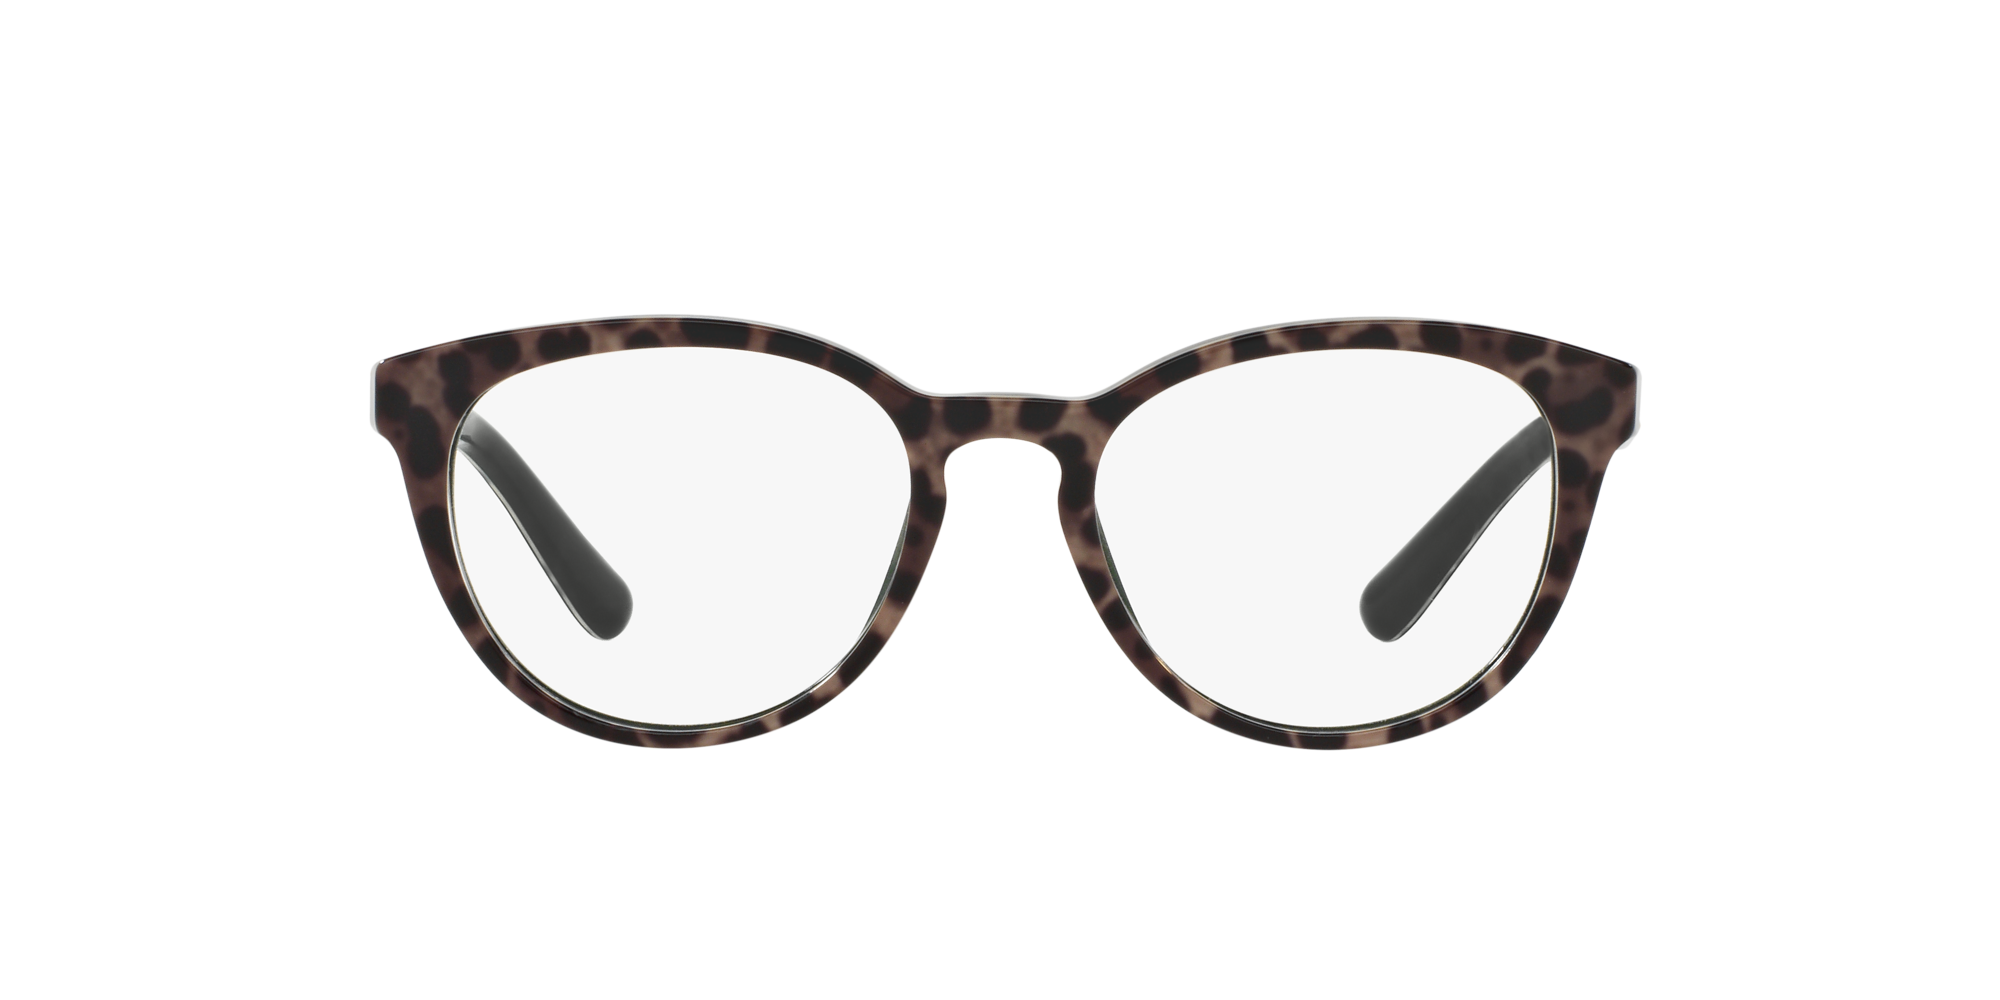 Image for DG3268 from LensCrafters | Glasses, Prescription Glasses Online, Eyewear